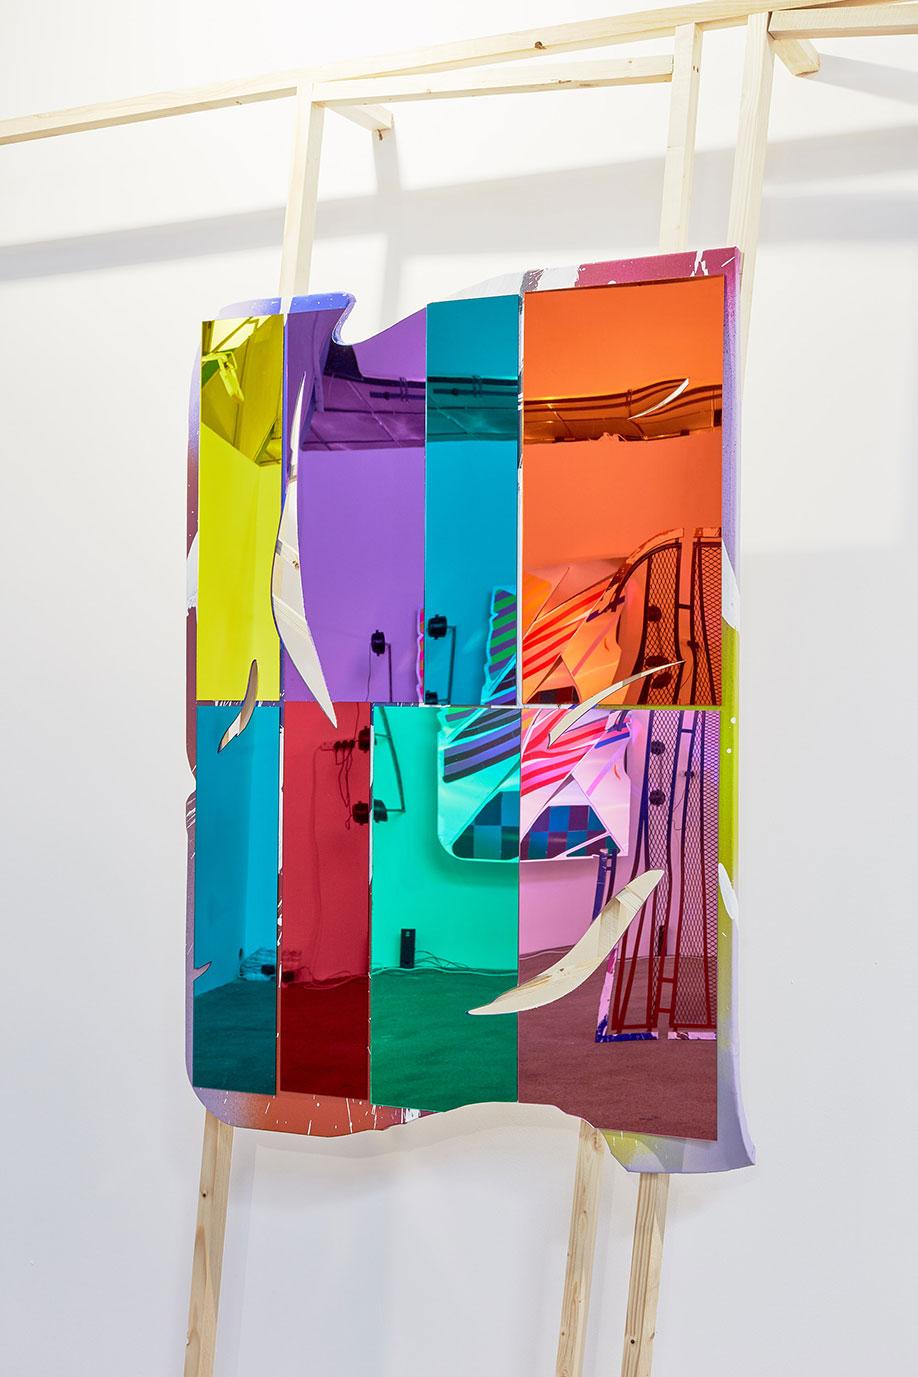 <b>Title:&nbsp;</b>High All the Time 04<br /><b>Year:&nbsp;</b>2018<br /><b>Medium:&nbsp;</b>Laser cut mirror perspex, acrylic, canvas, wood<br /><b>Size:&nbsp;</b>130 x 90 cm